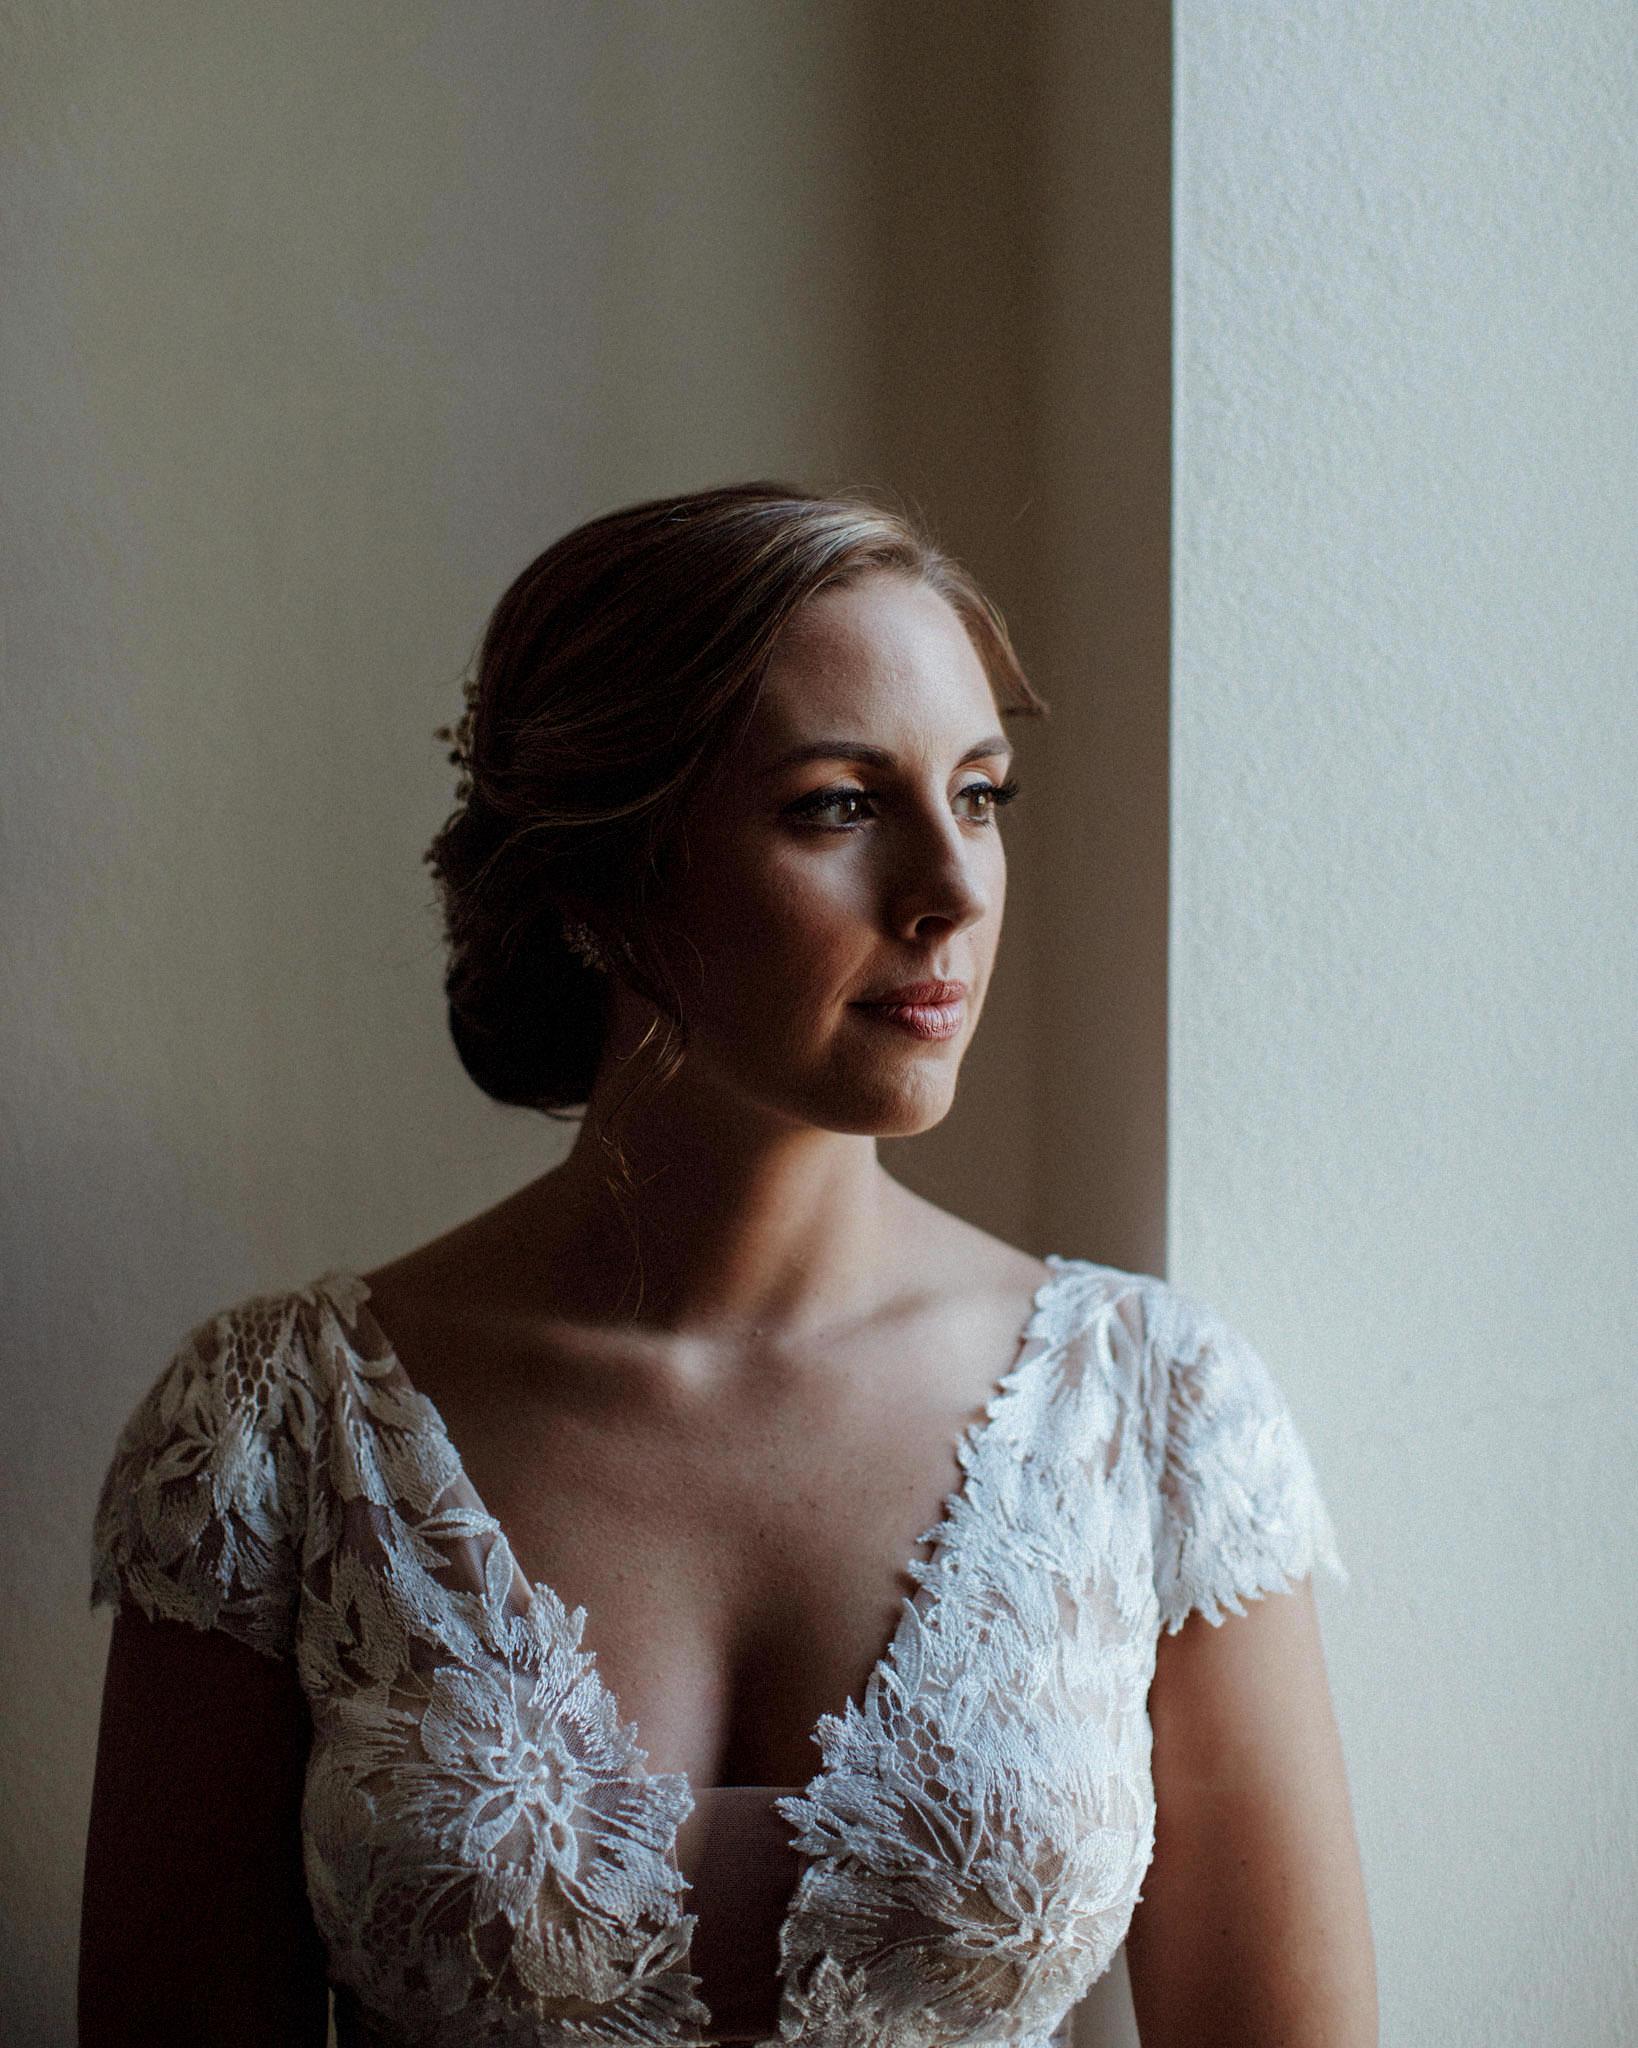 St. Francics Xavier and Madrid Theaater Wedding_Kindling Wedding Photography Kansas City_01.JPG